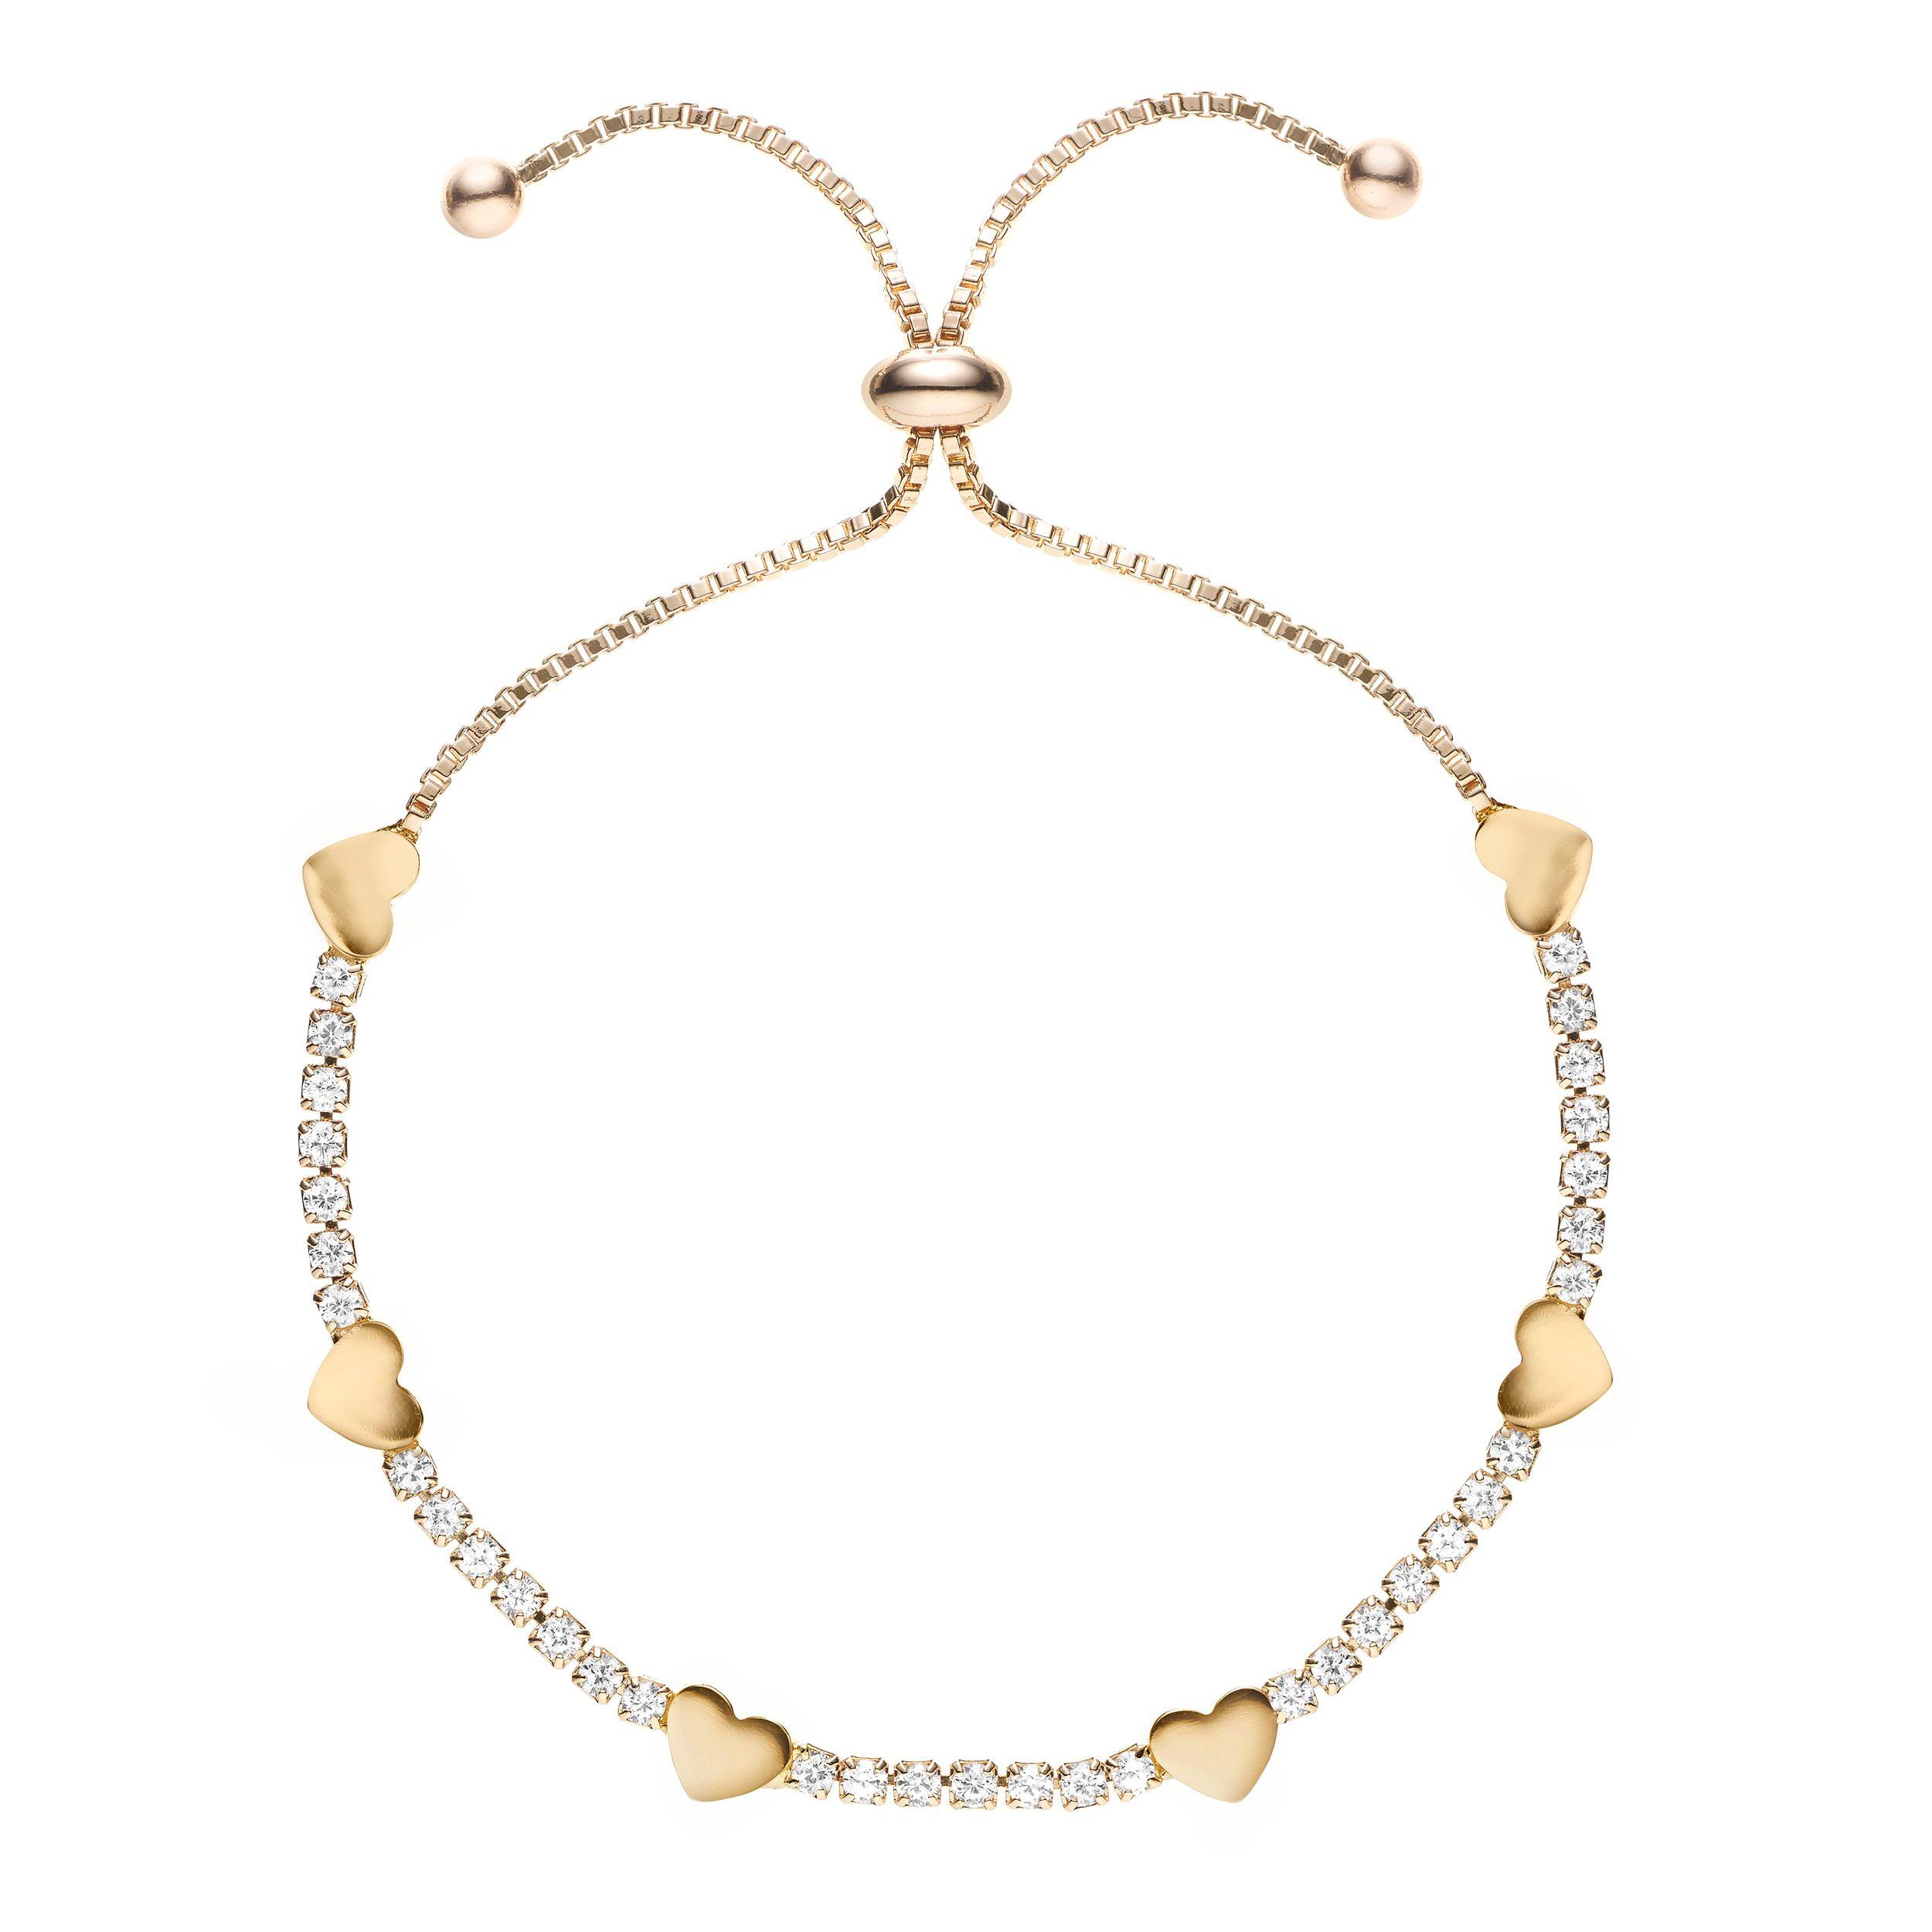 Buckley London Hugs & Kisses '♥' Bracelet - Gold